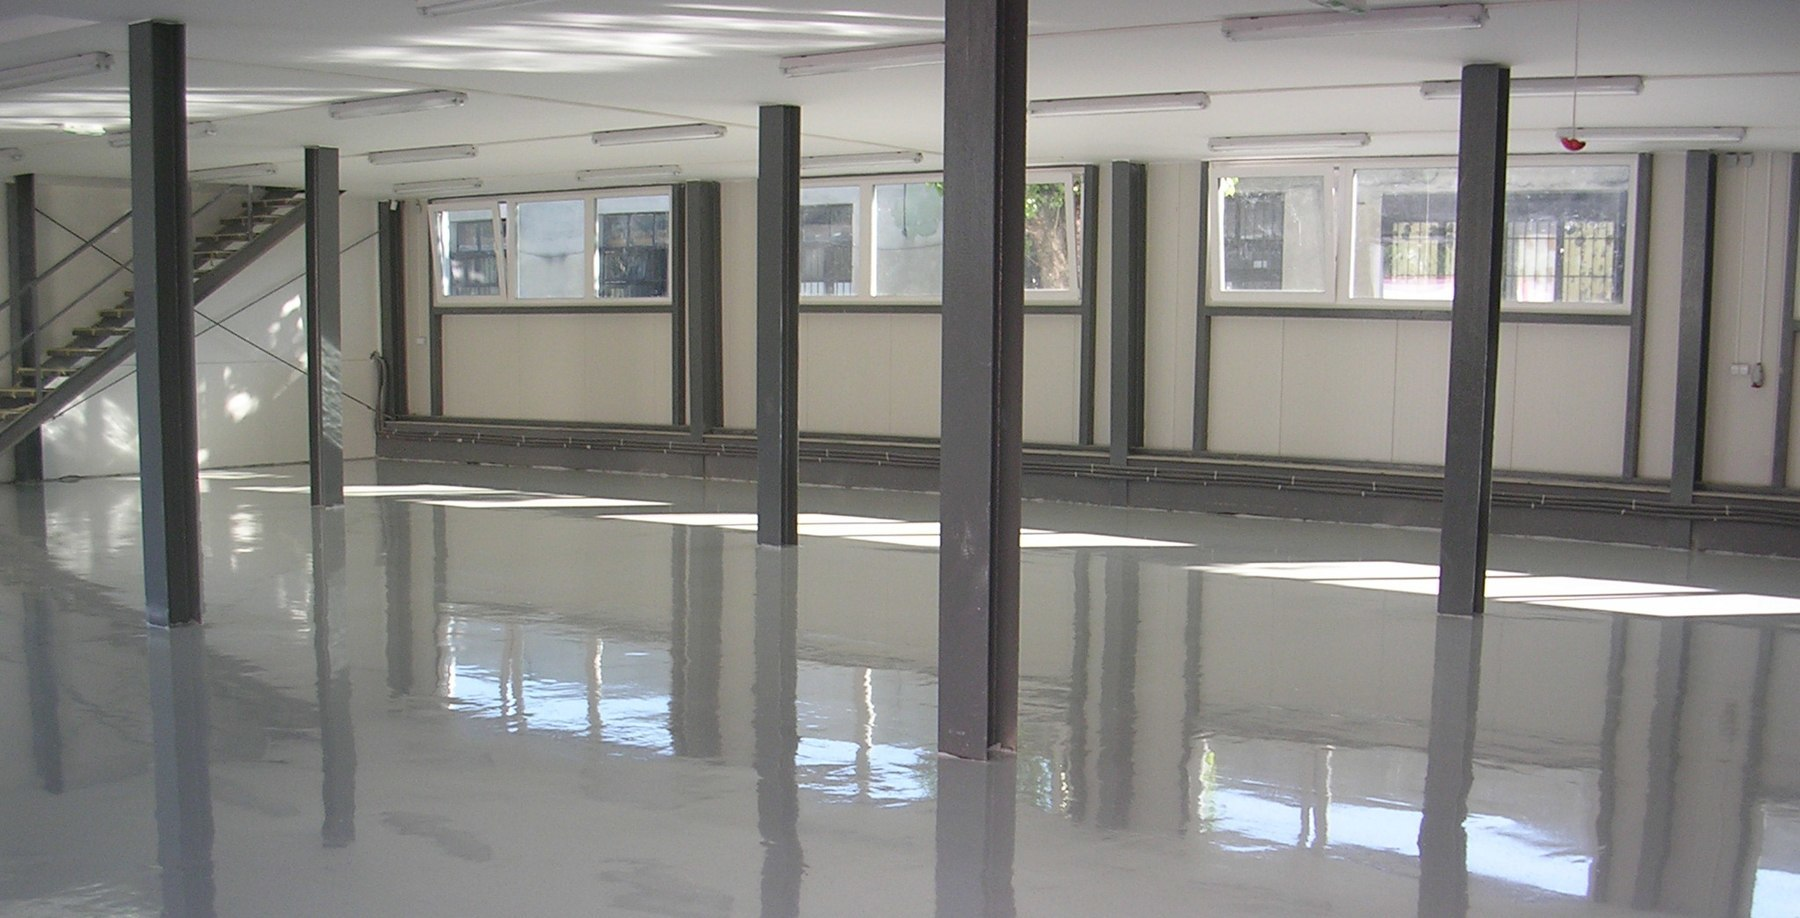 Liate podlahy - cenová ponuka, kontakt